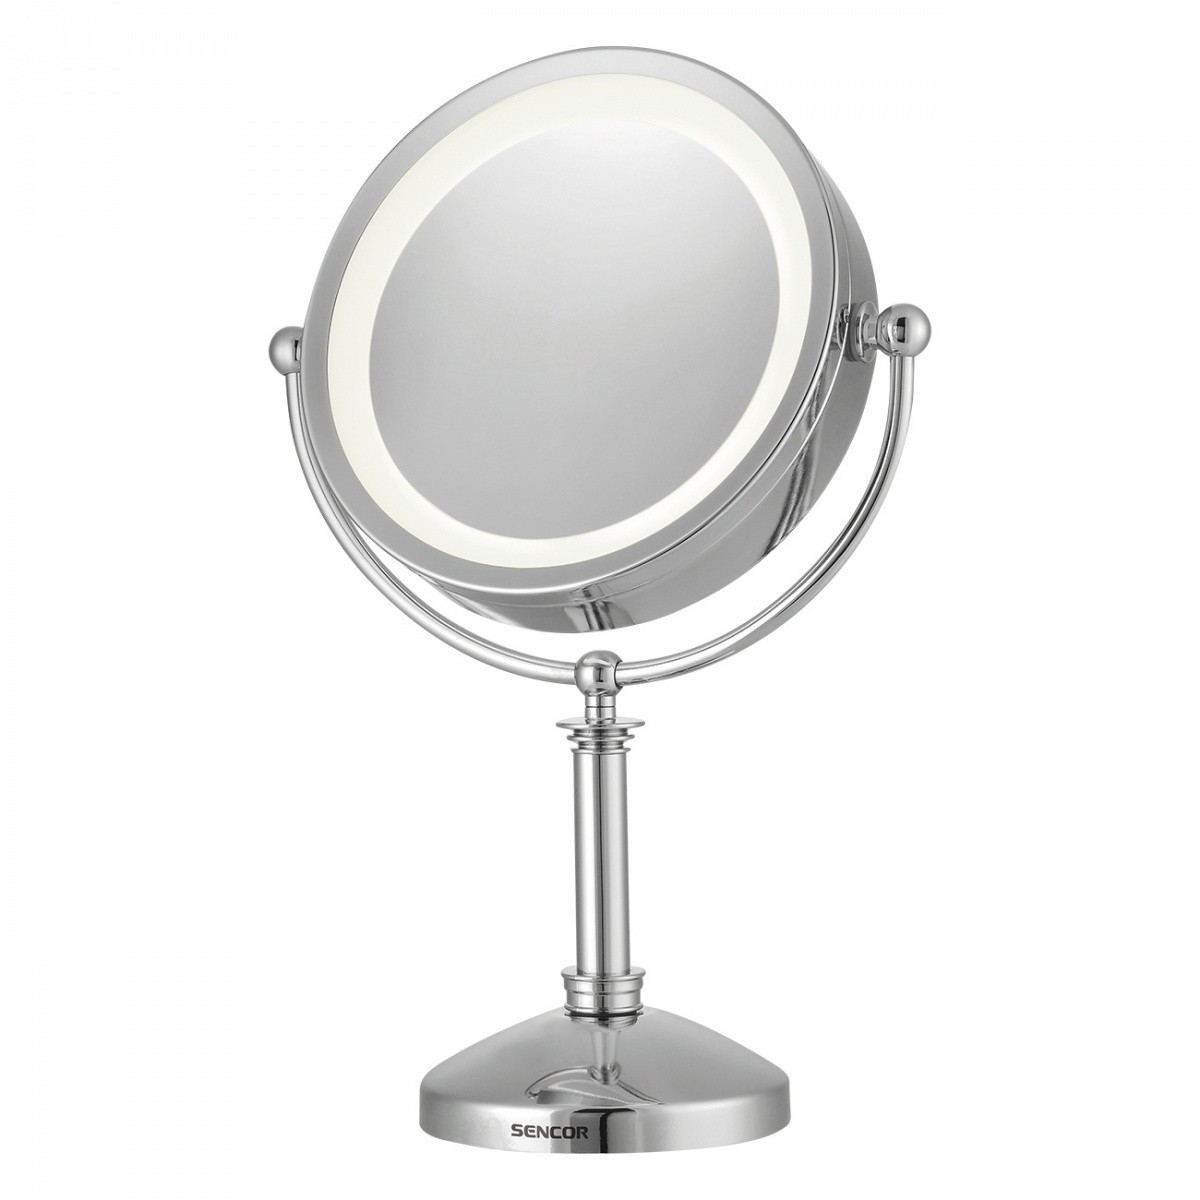 Sencor Double-sided Make-up Mirror Power 5 W Spogulis